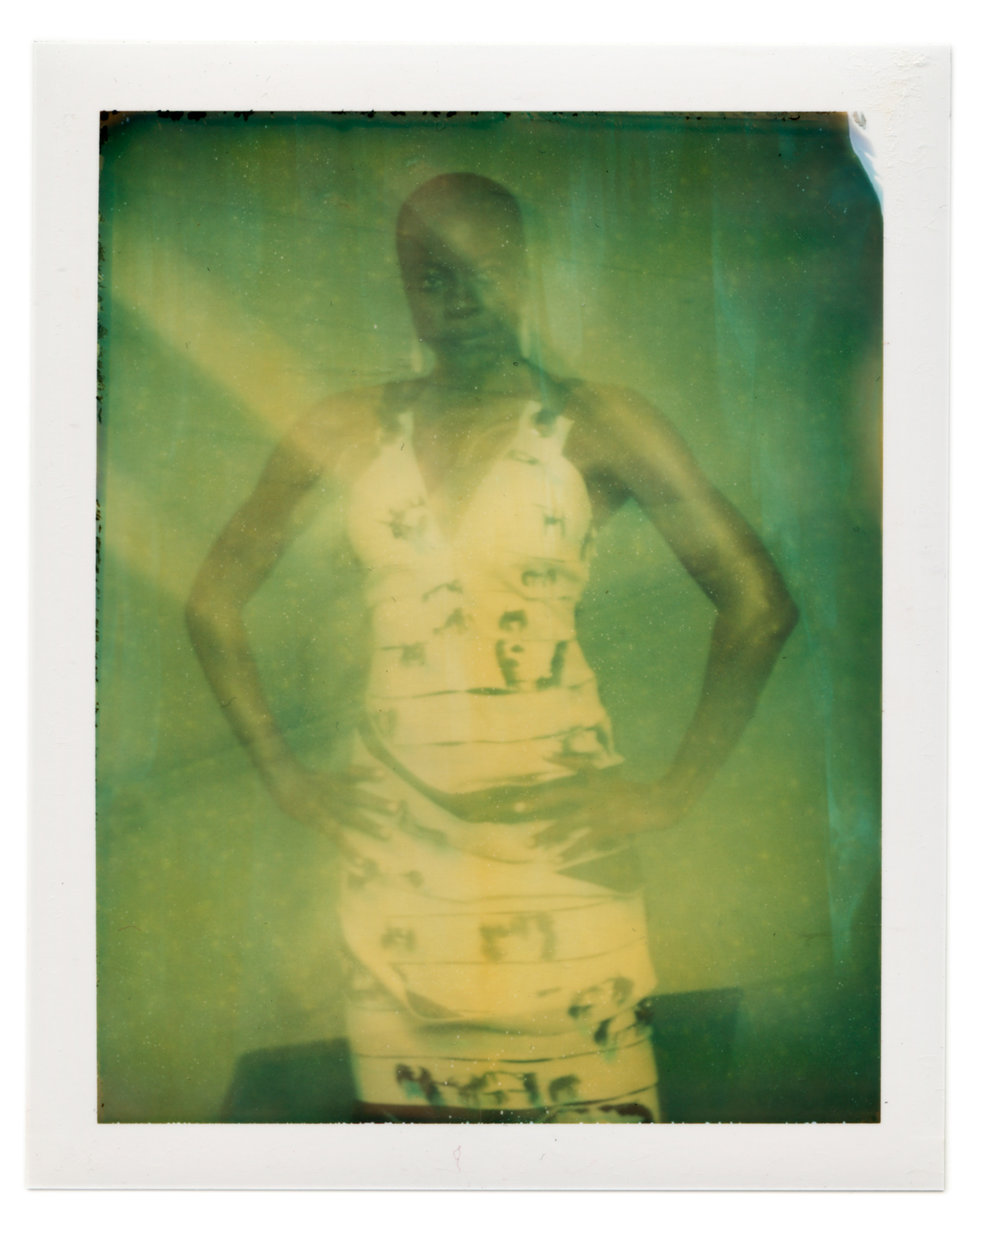 Danai_Gurira_Benjo_Arwas_Polaroid_18.jpg